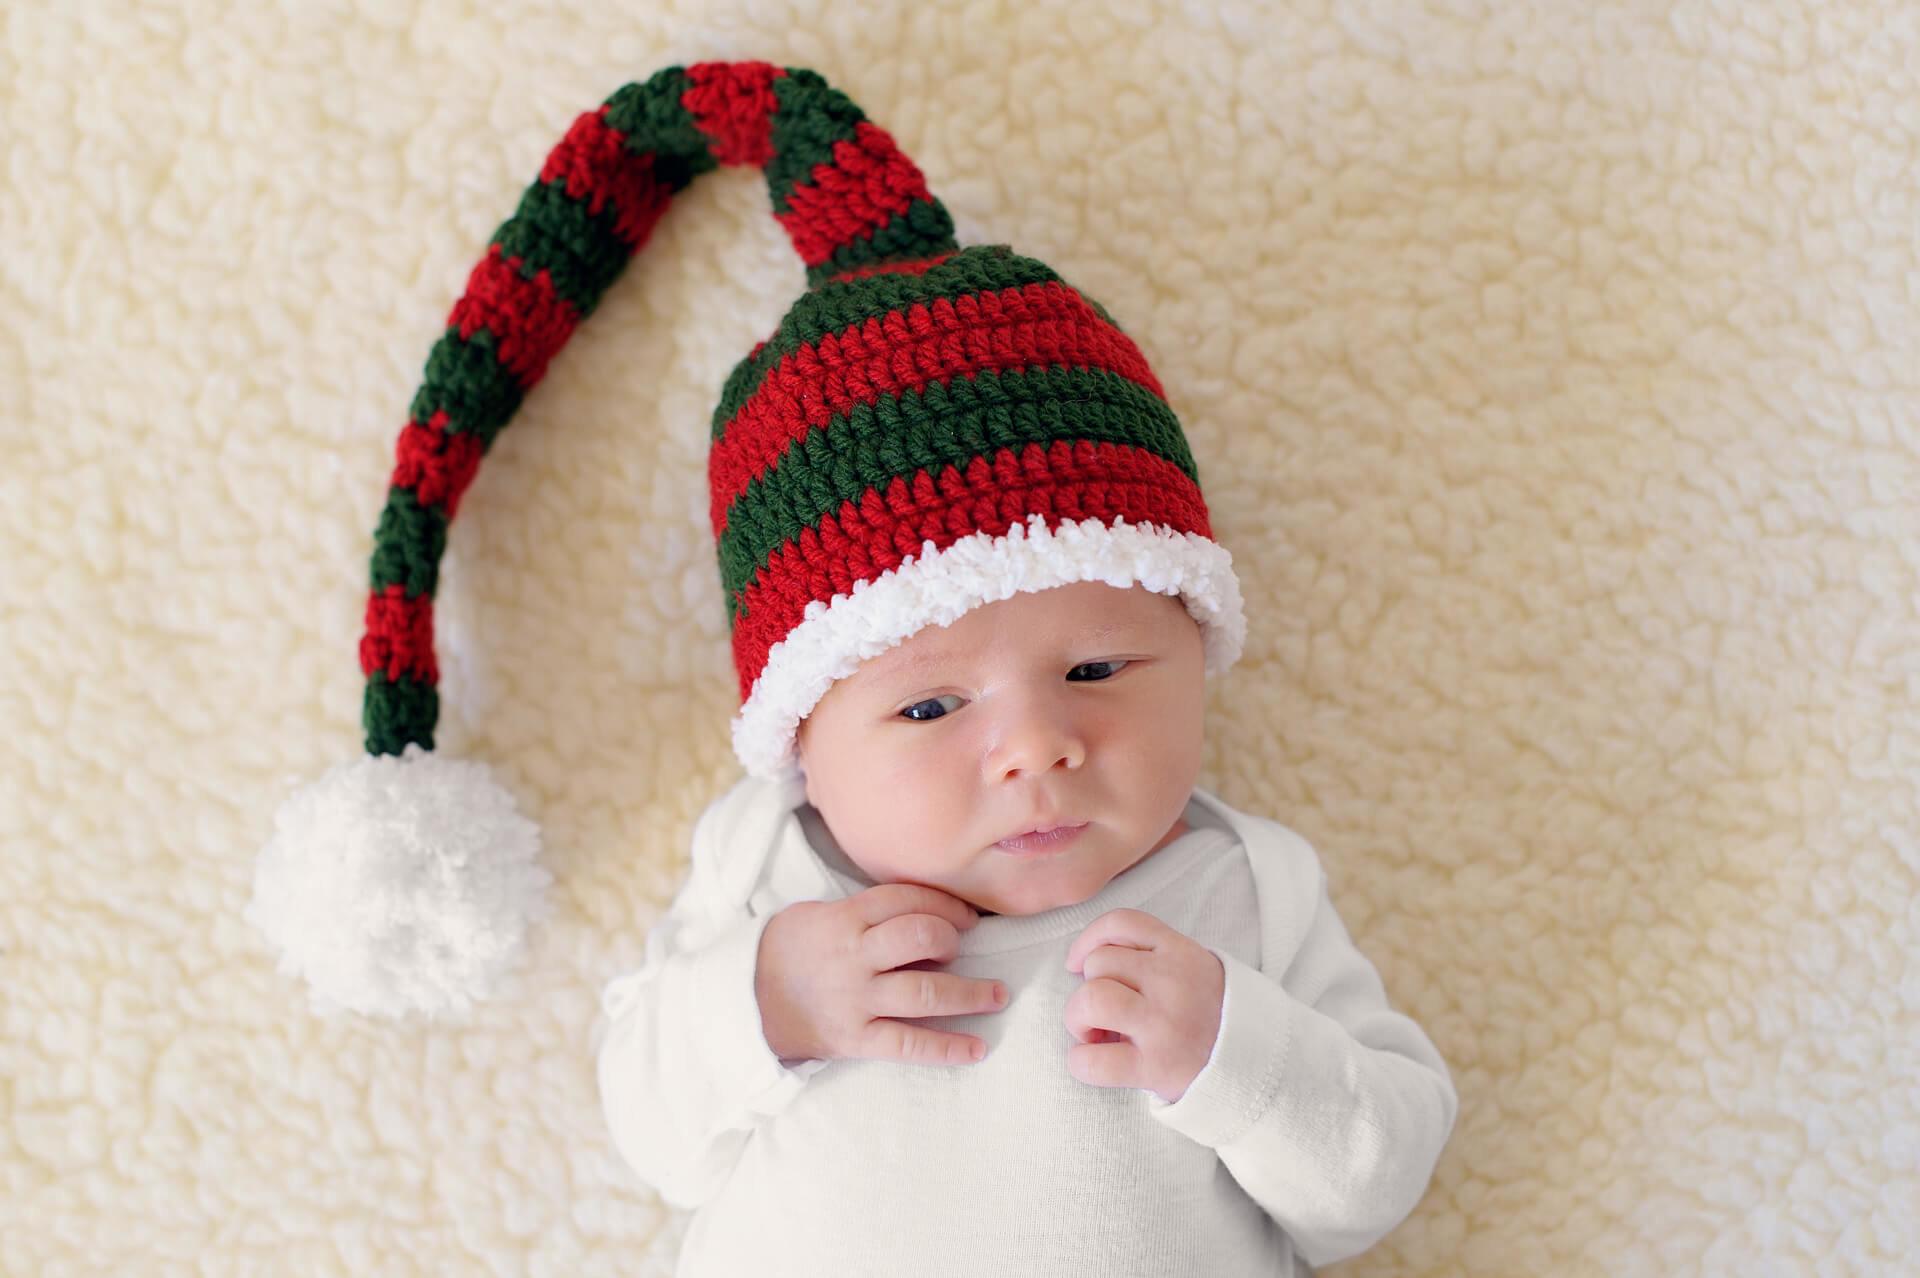 novorodenec-newborn-atelier-interier-umelecke-fotenie-vianoce-fotograf-rimavska-sobota-peter-norulak_04